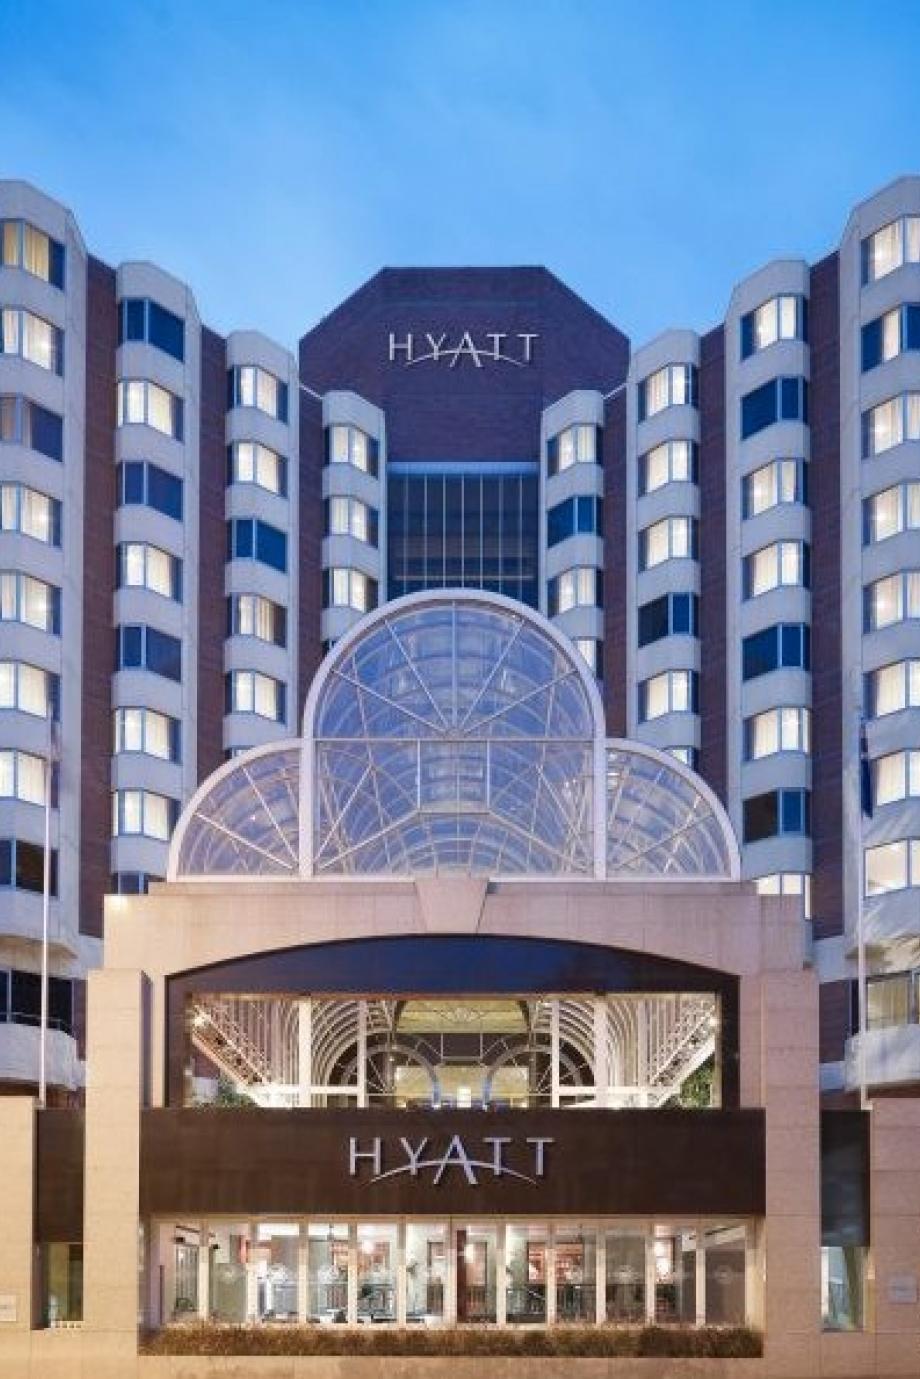 LisboaCool_Blog_O primeiro Hyatt Regency vai abrir em Lisboa